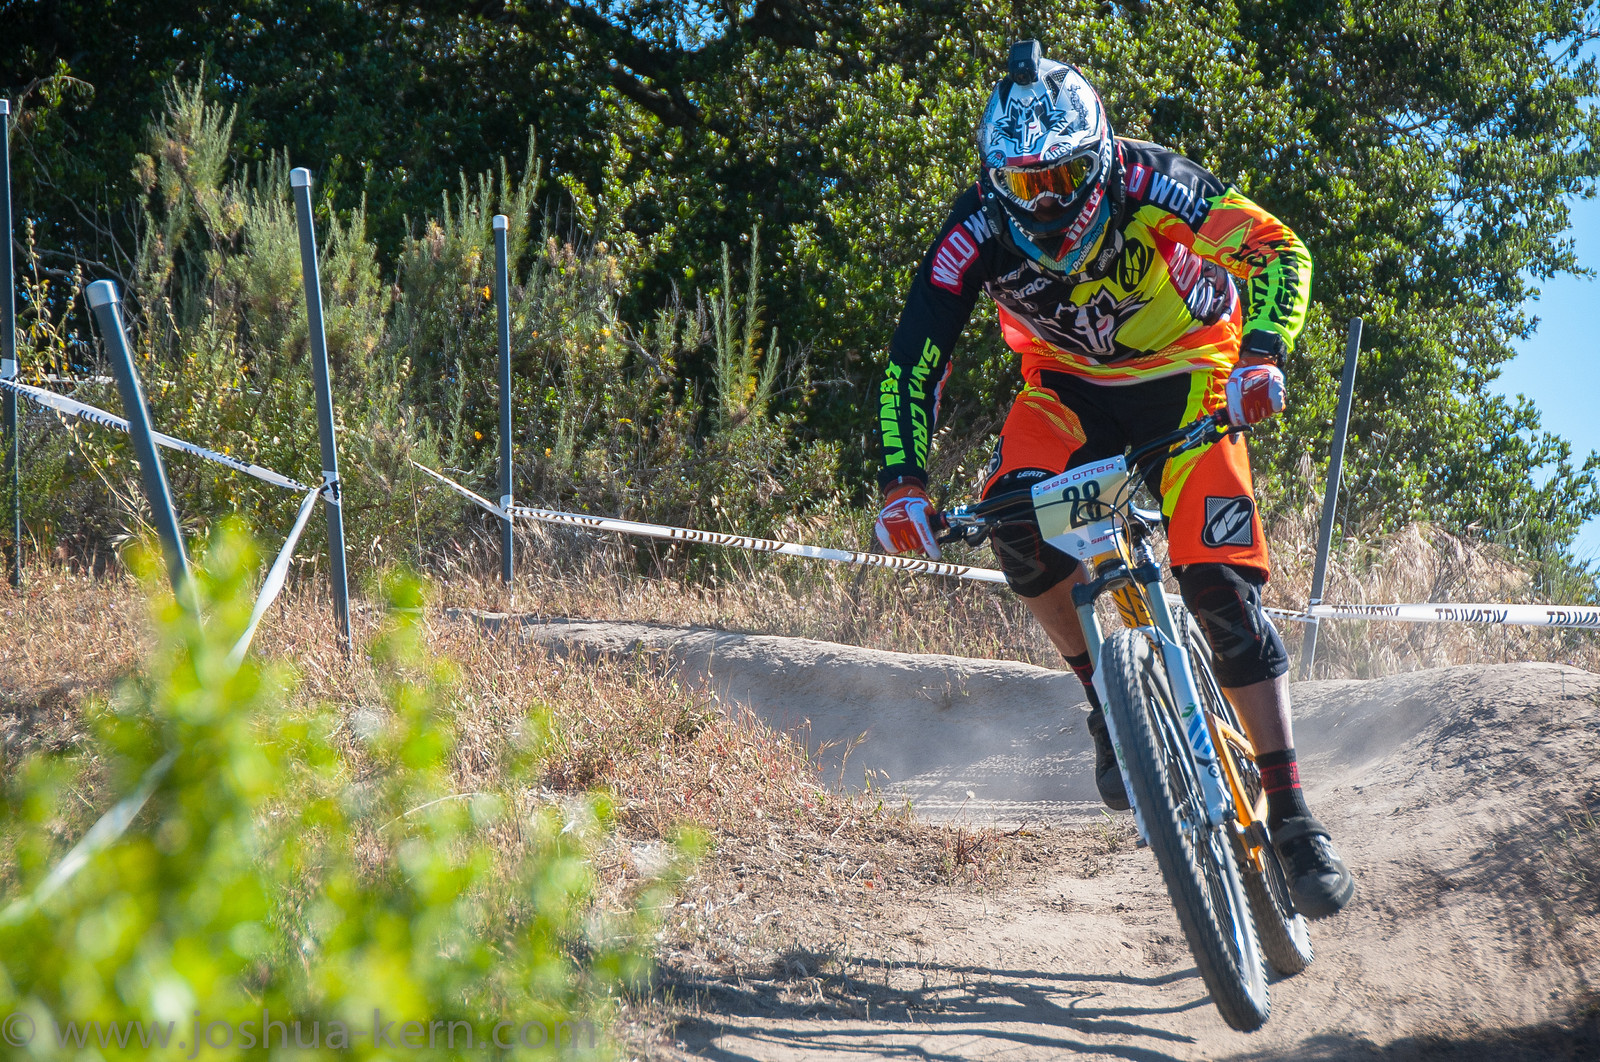 4-18-13DHPractice (10 of 17) - jkern620 - Mountain Biking Pictures - Vital MTB